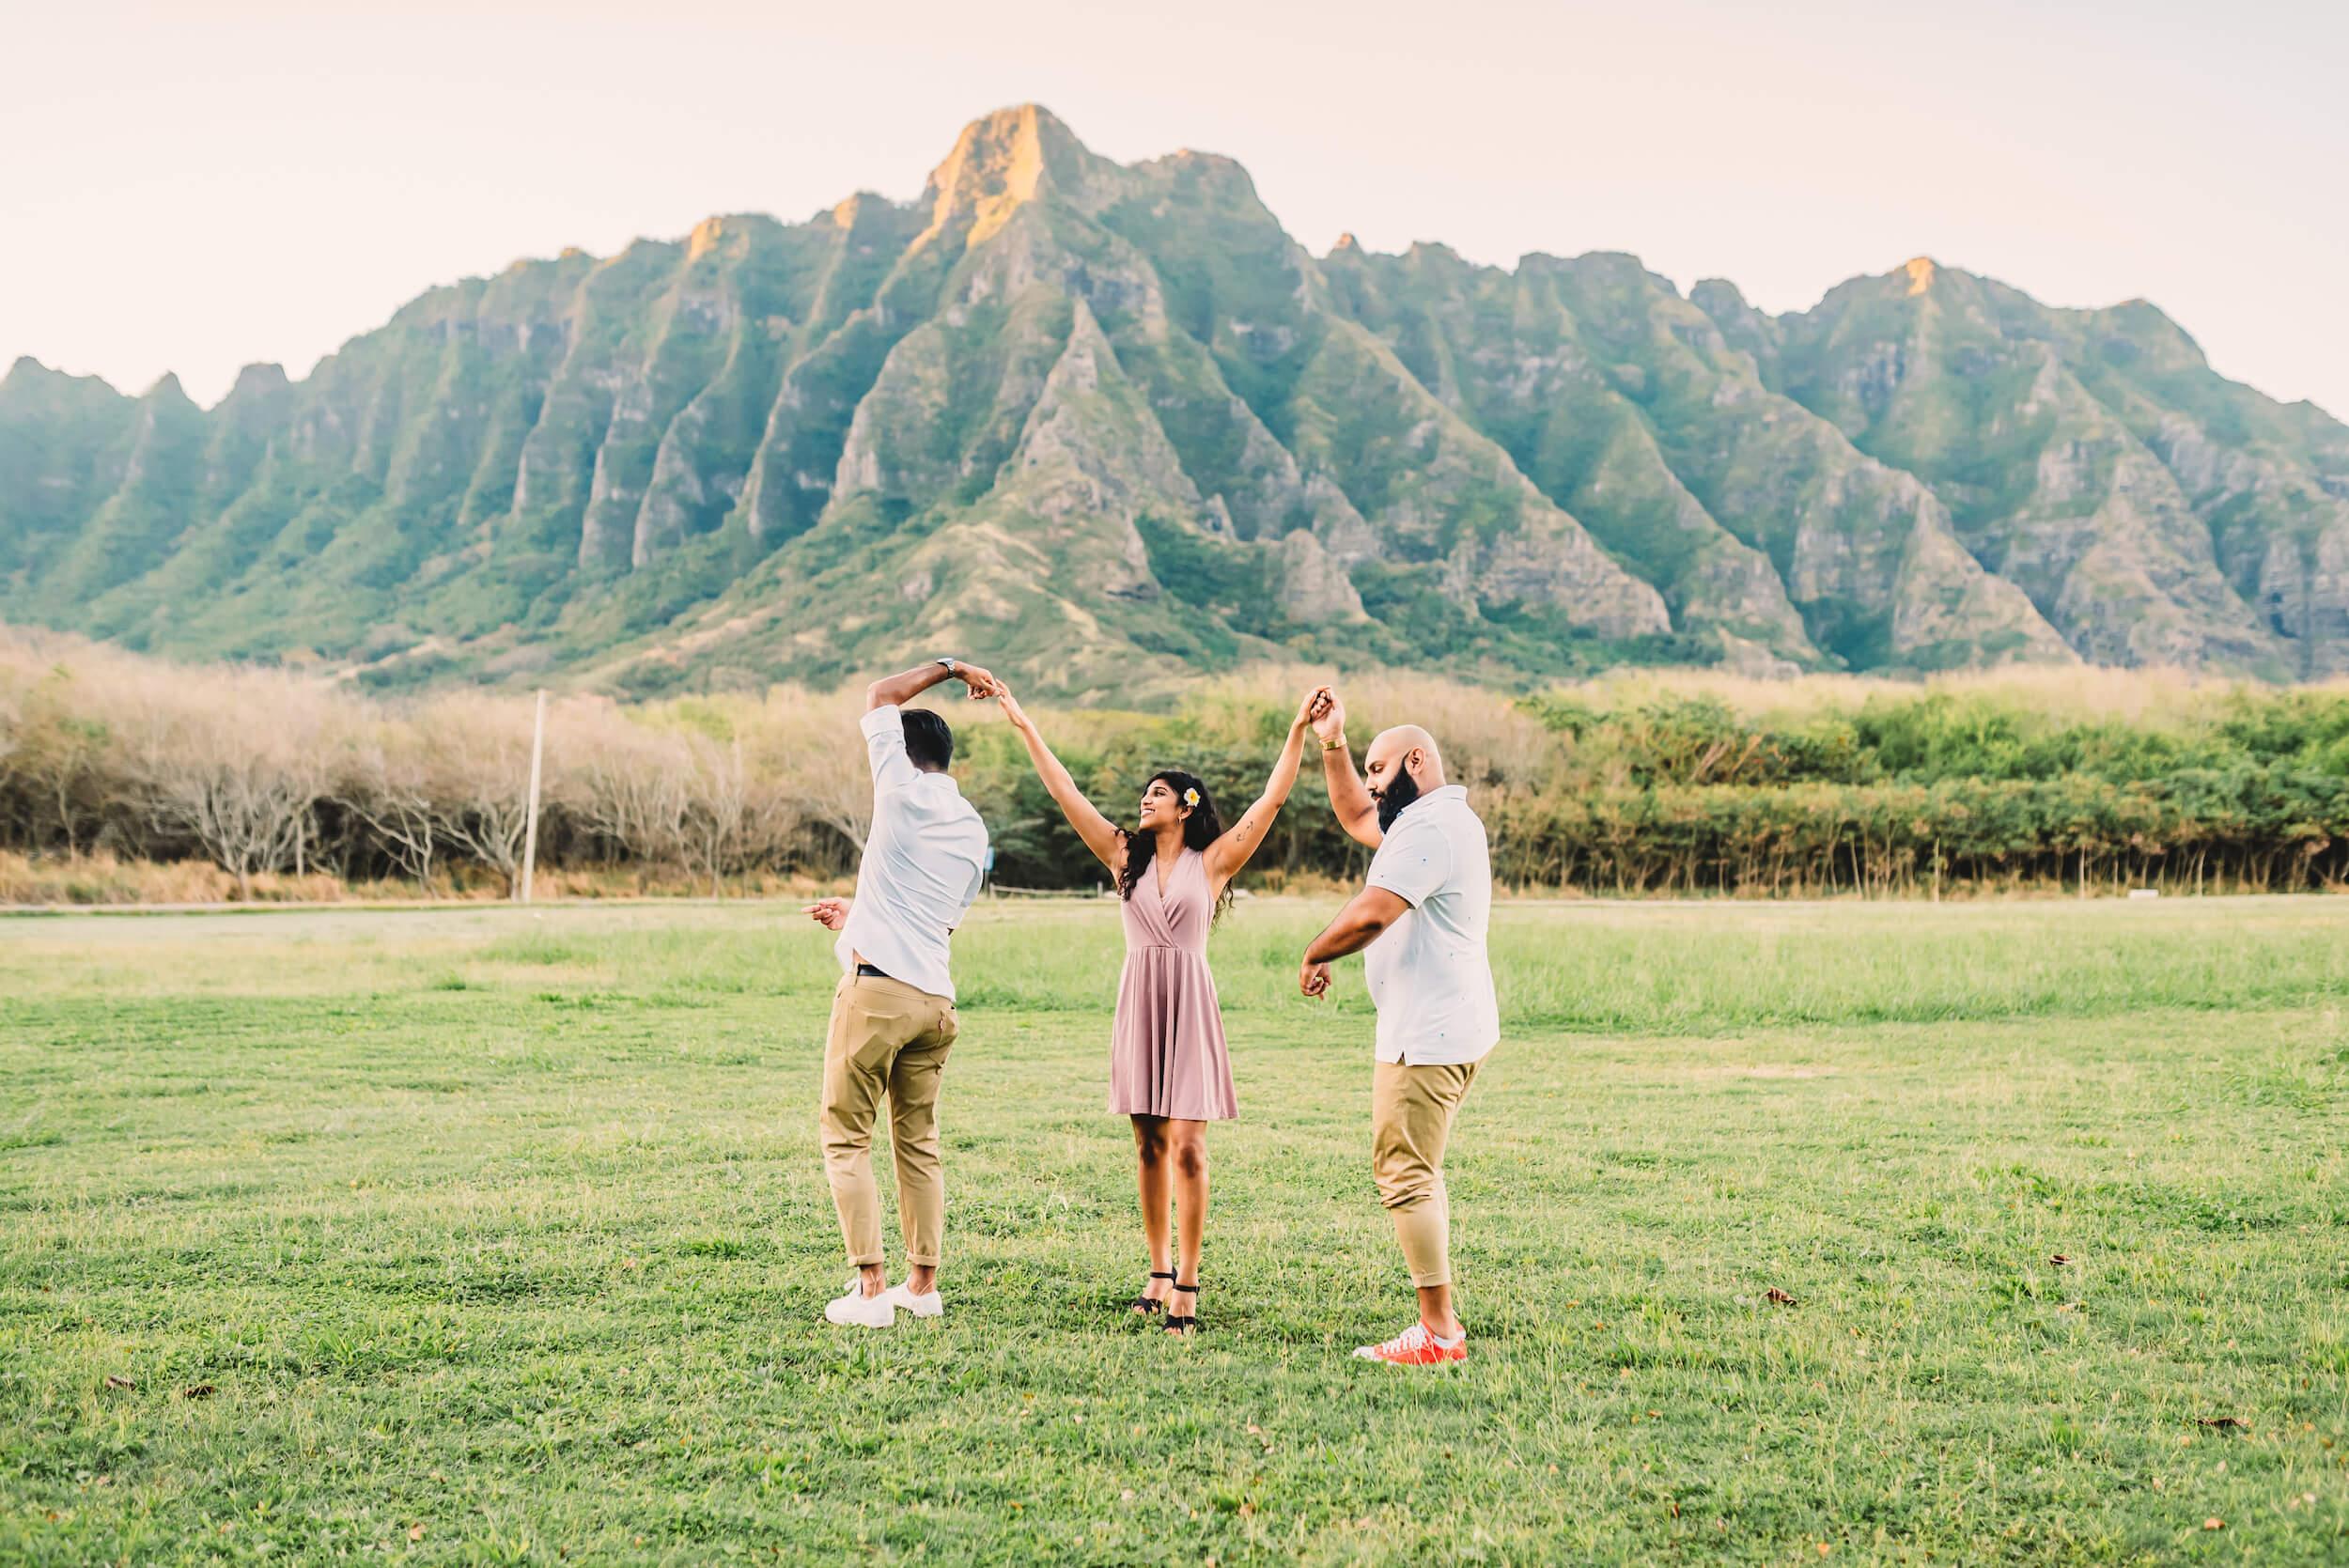 Family vacation in Honolulu Hawaii USA